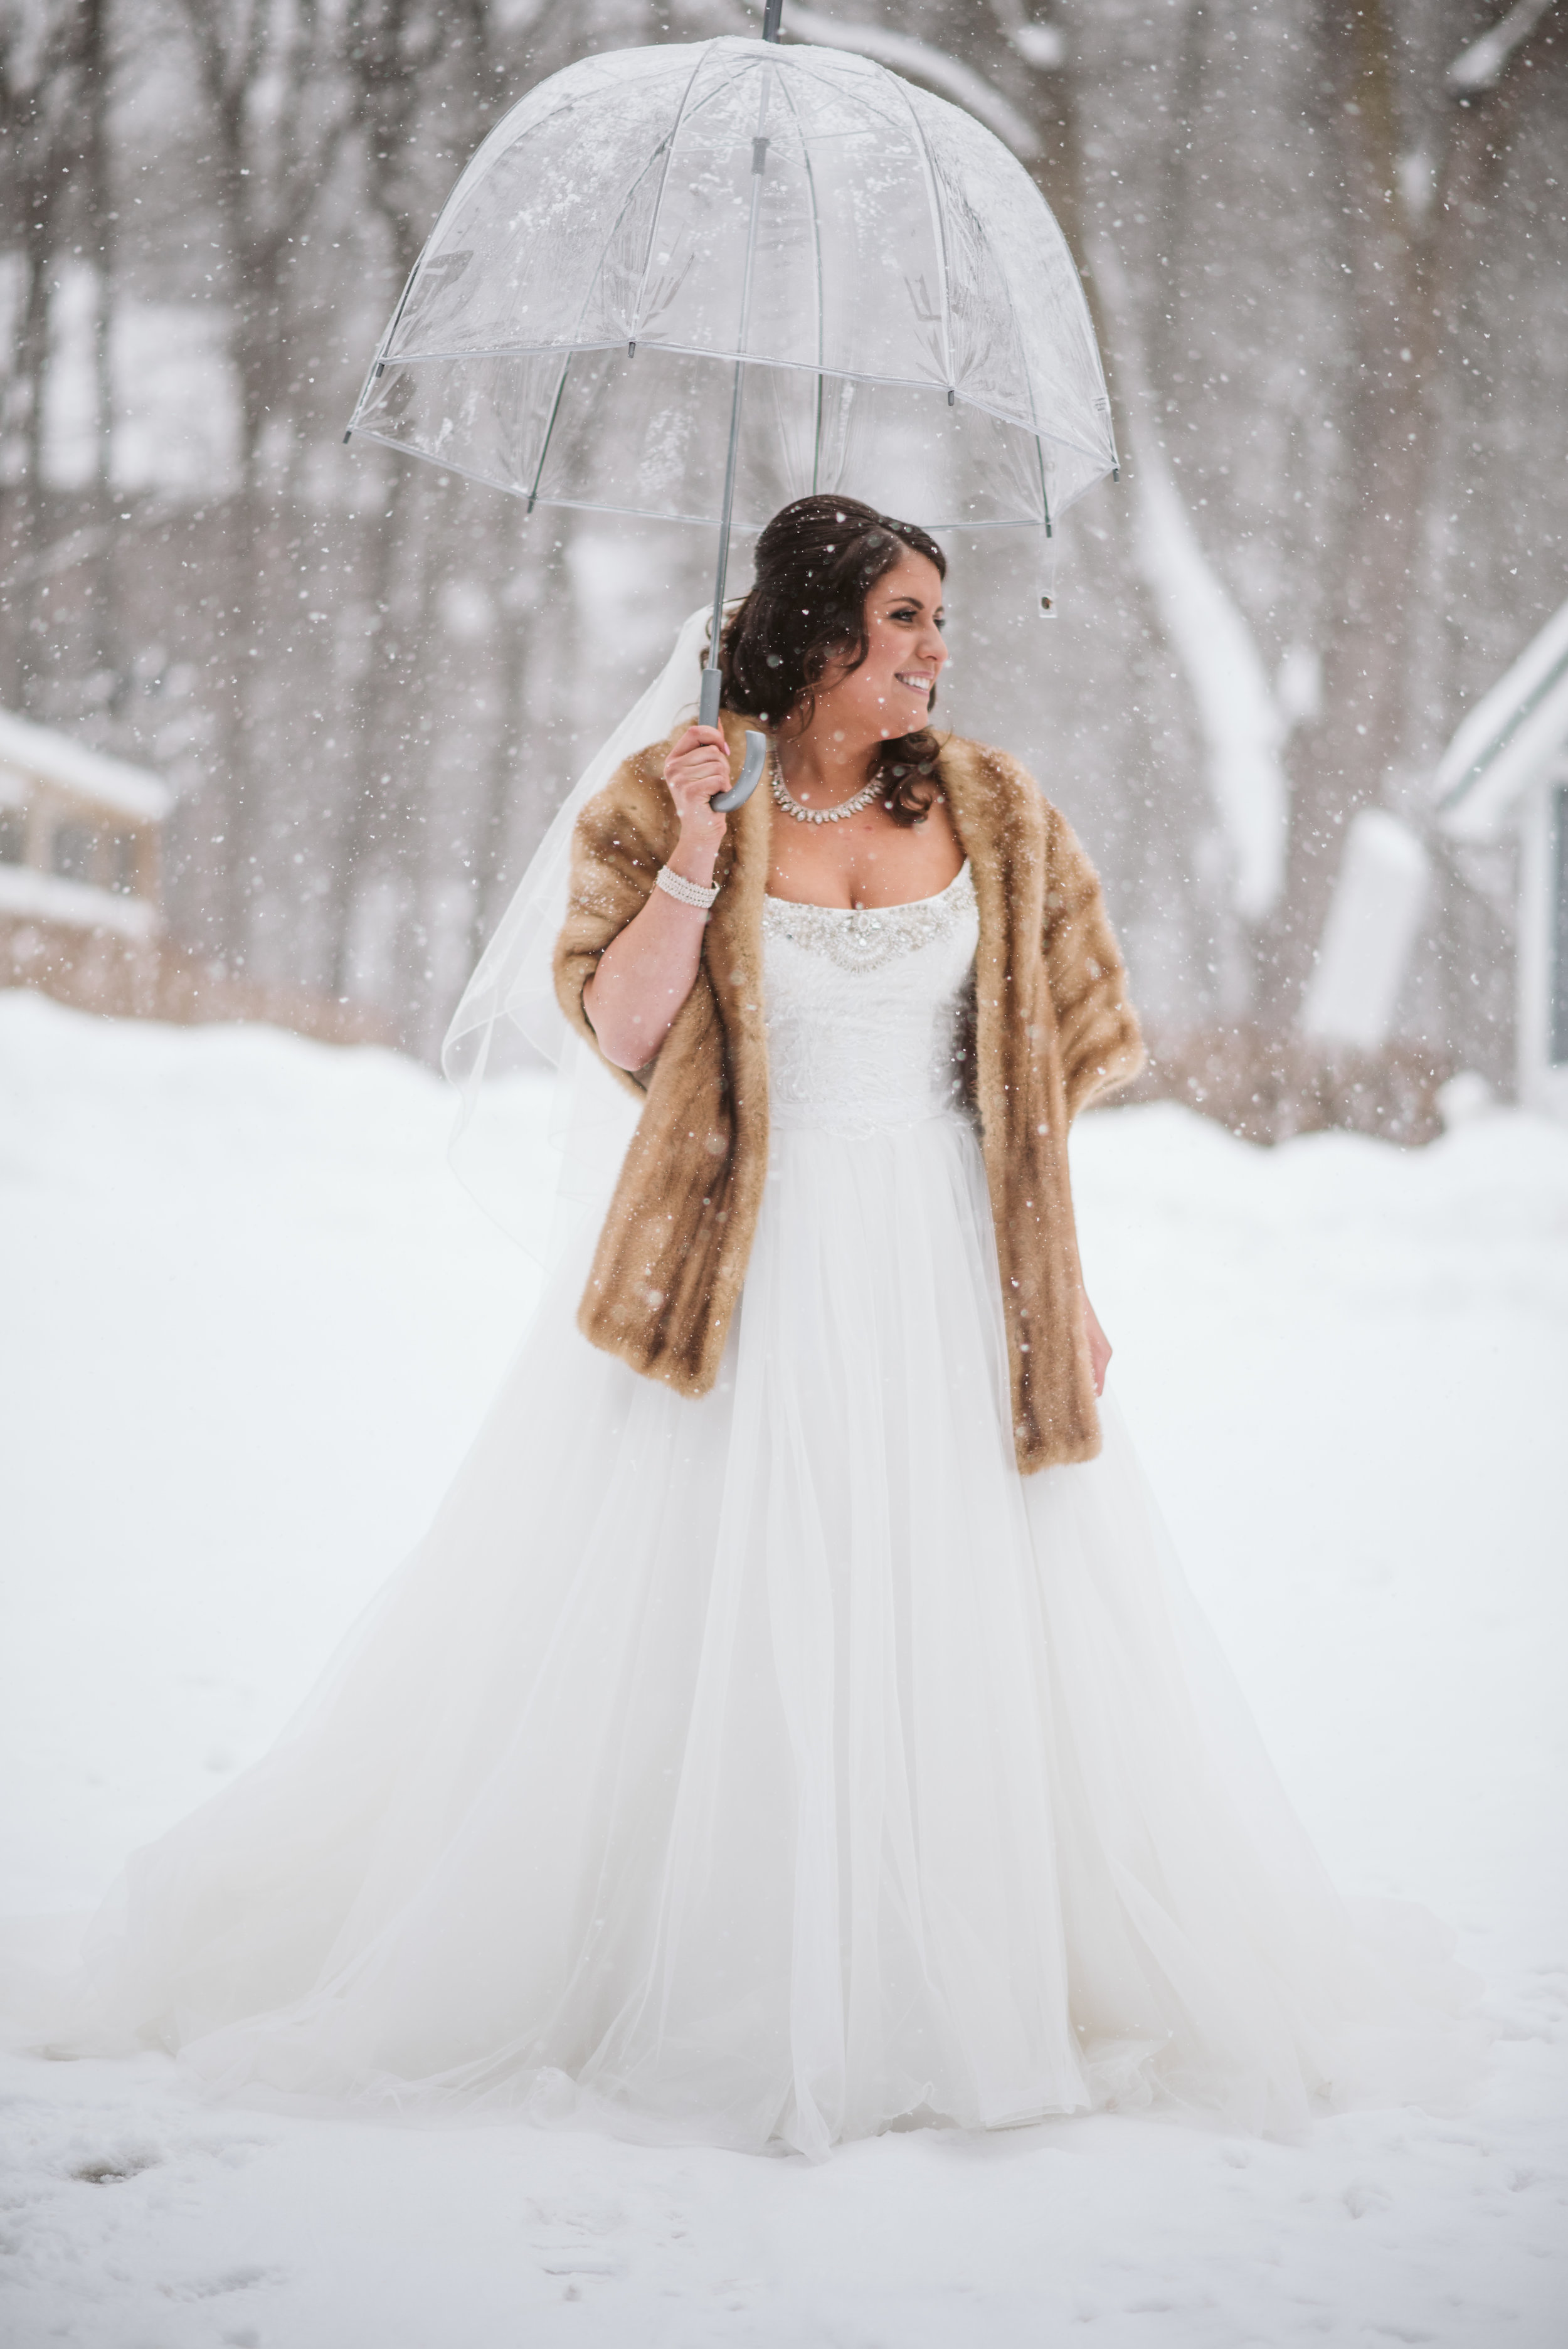 Bride under umbrella in the snow